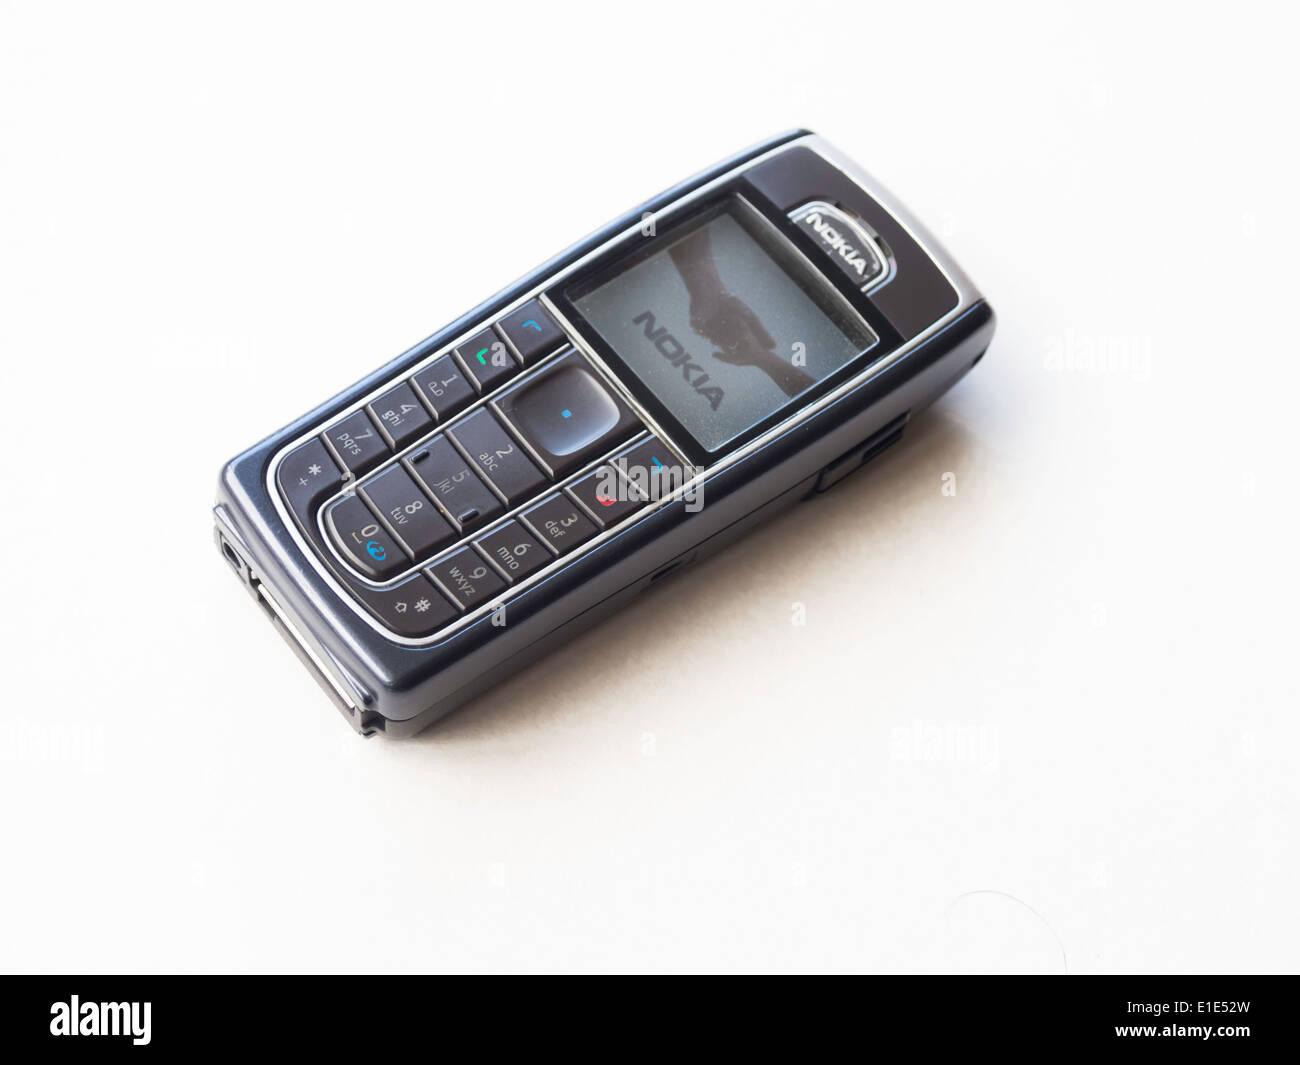 Nokia 6230 GSM Bluetooth Mobile Phone - Stock Image